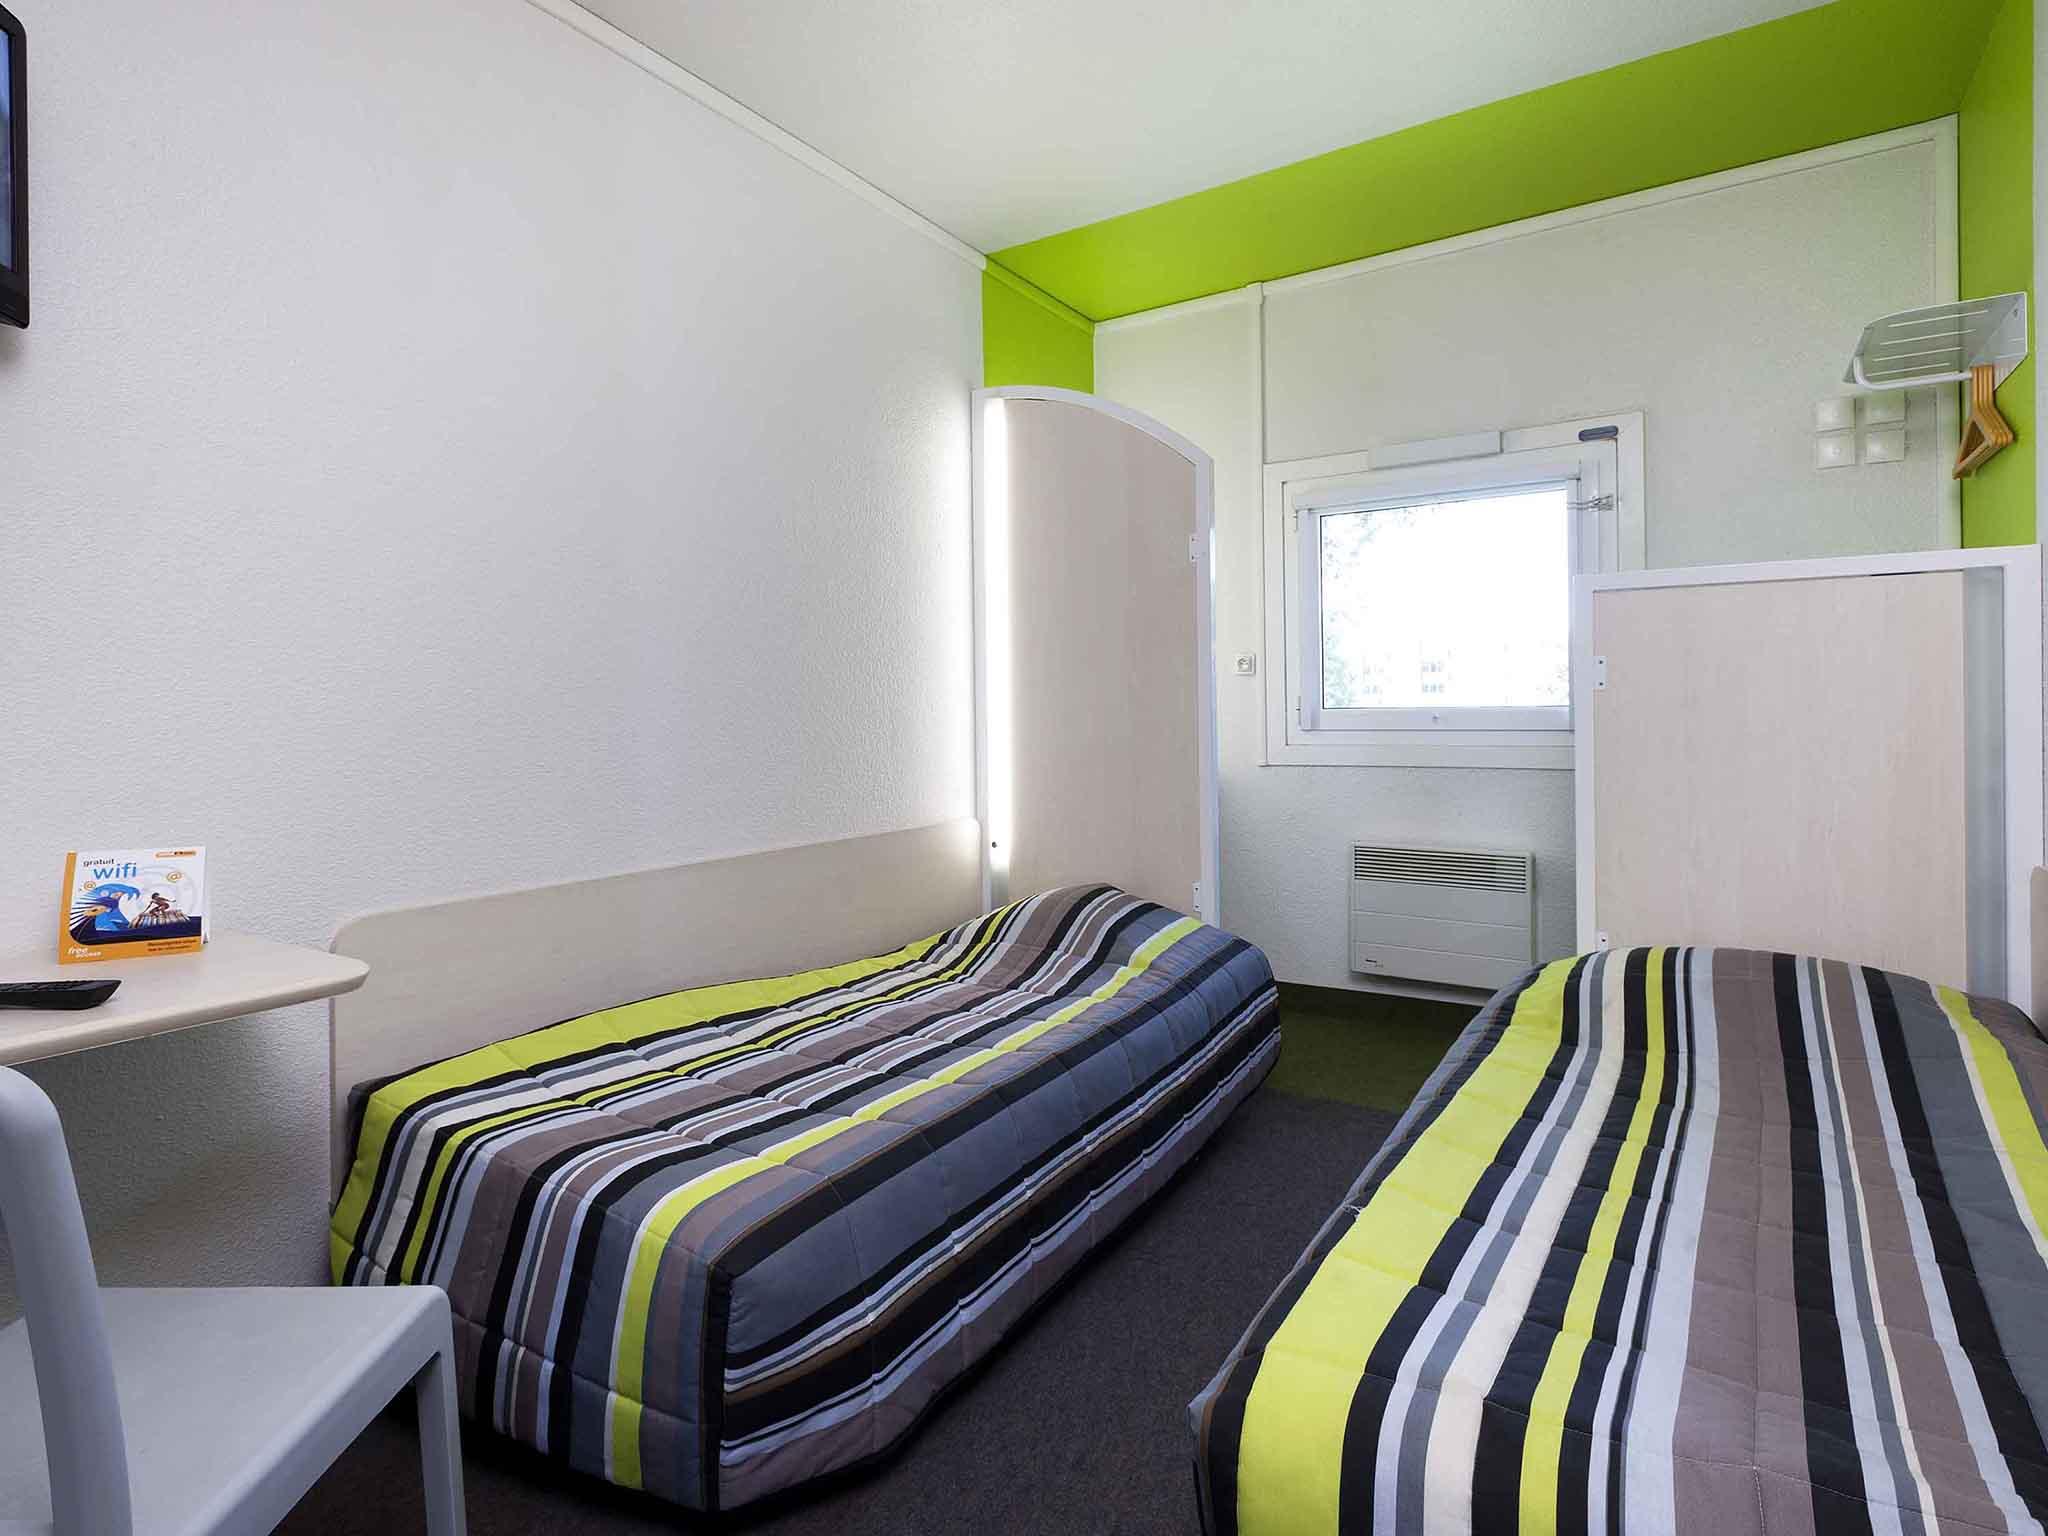 Hotell – hotelF1 Boulogne-sur-Mer